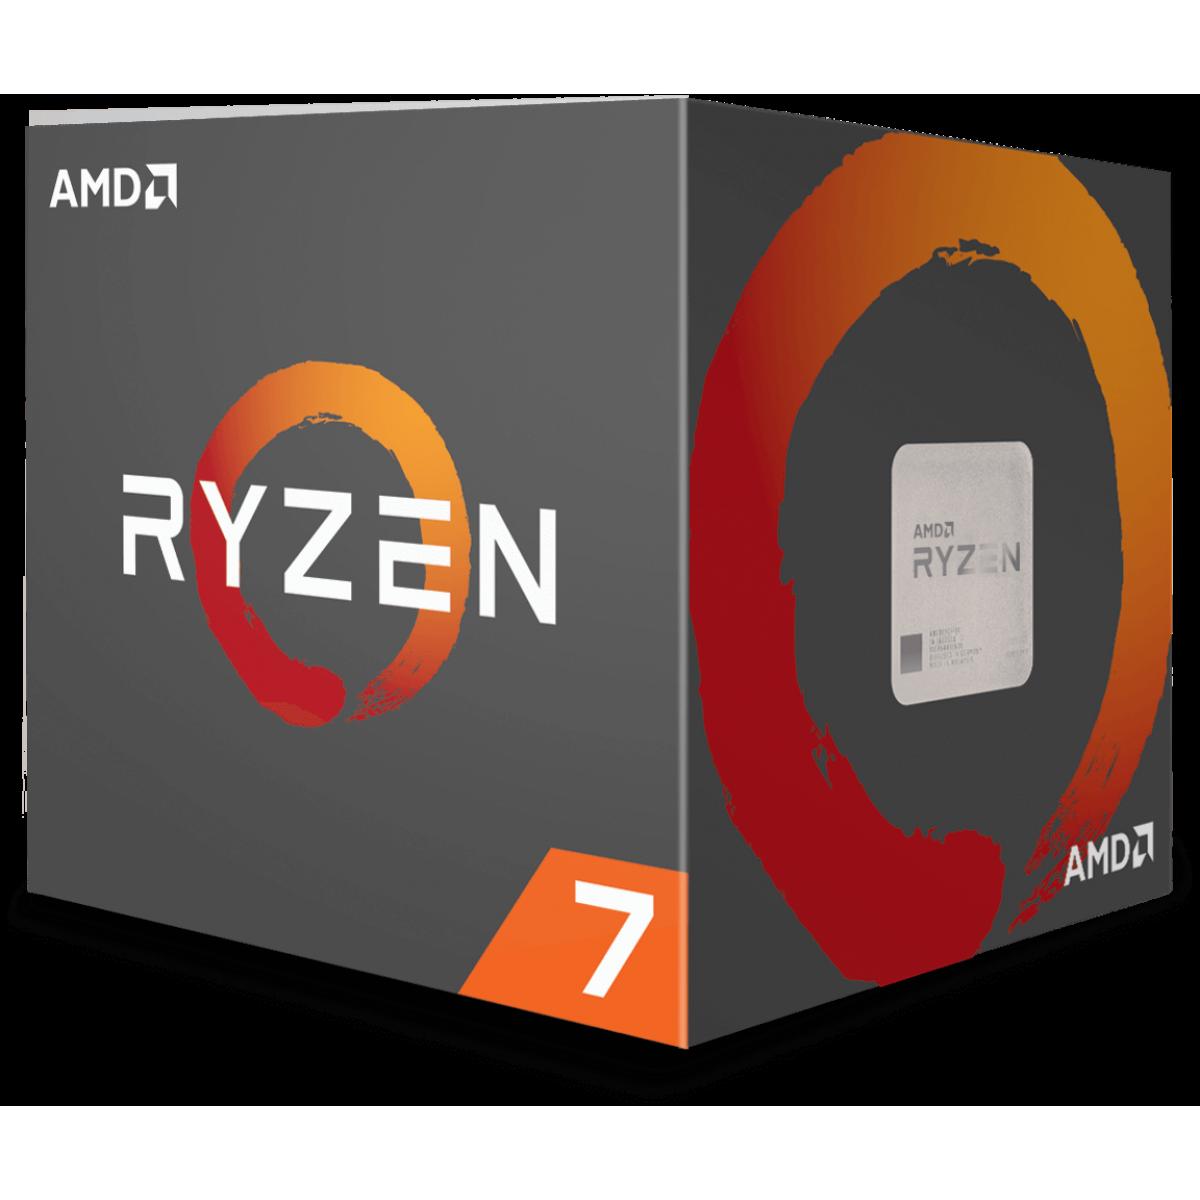 Processador AMD Ryzen 7 2700 3.2GHz / 4.1GHz Max Turbo YD2700BBAFBOX Octa Core 16MB Cooler Wraith Spire com LED, S/ Video